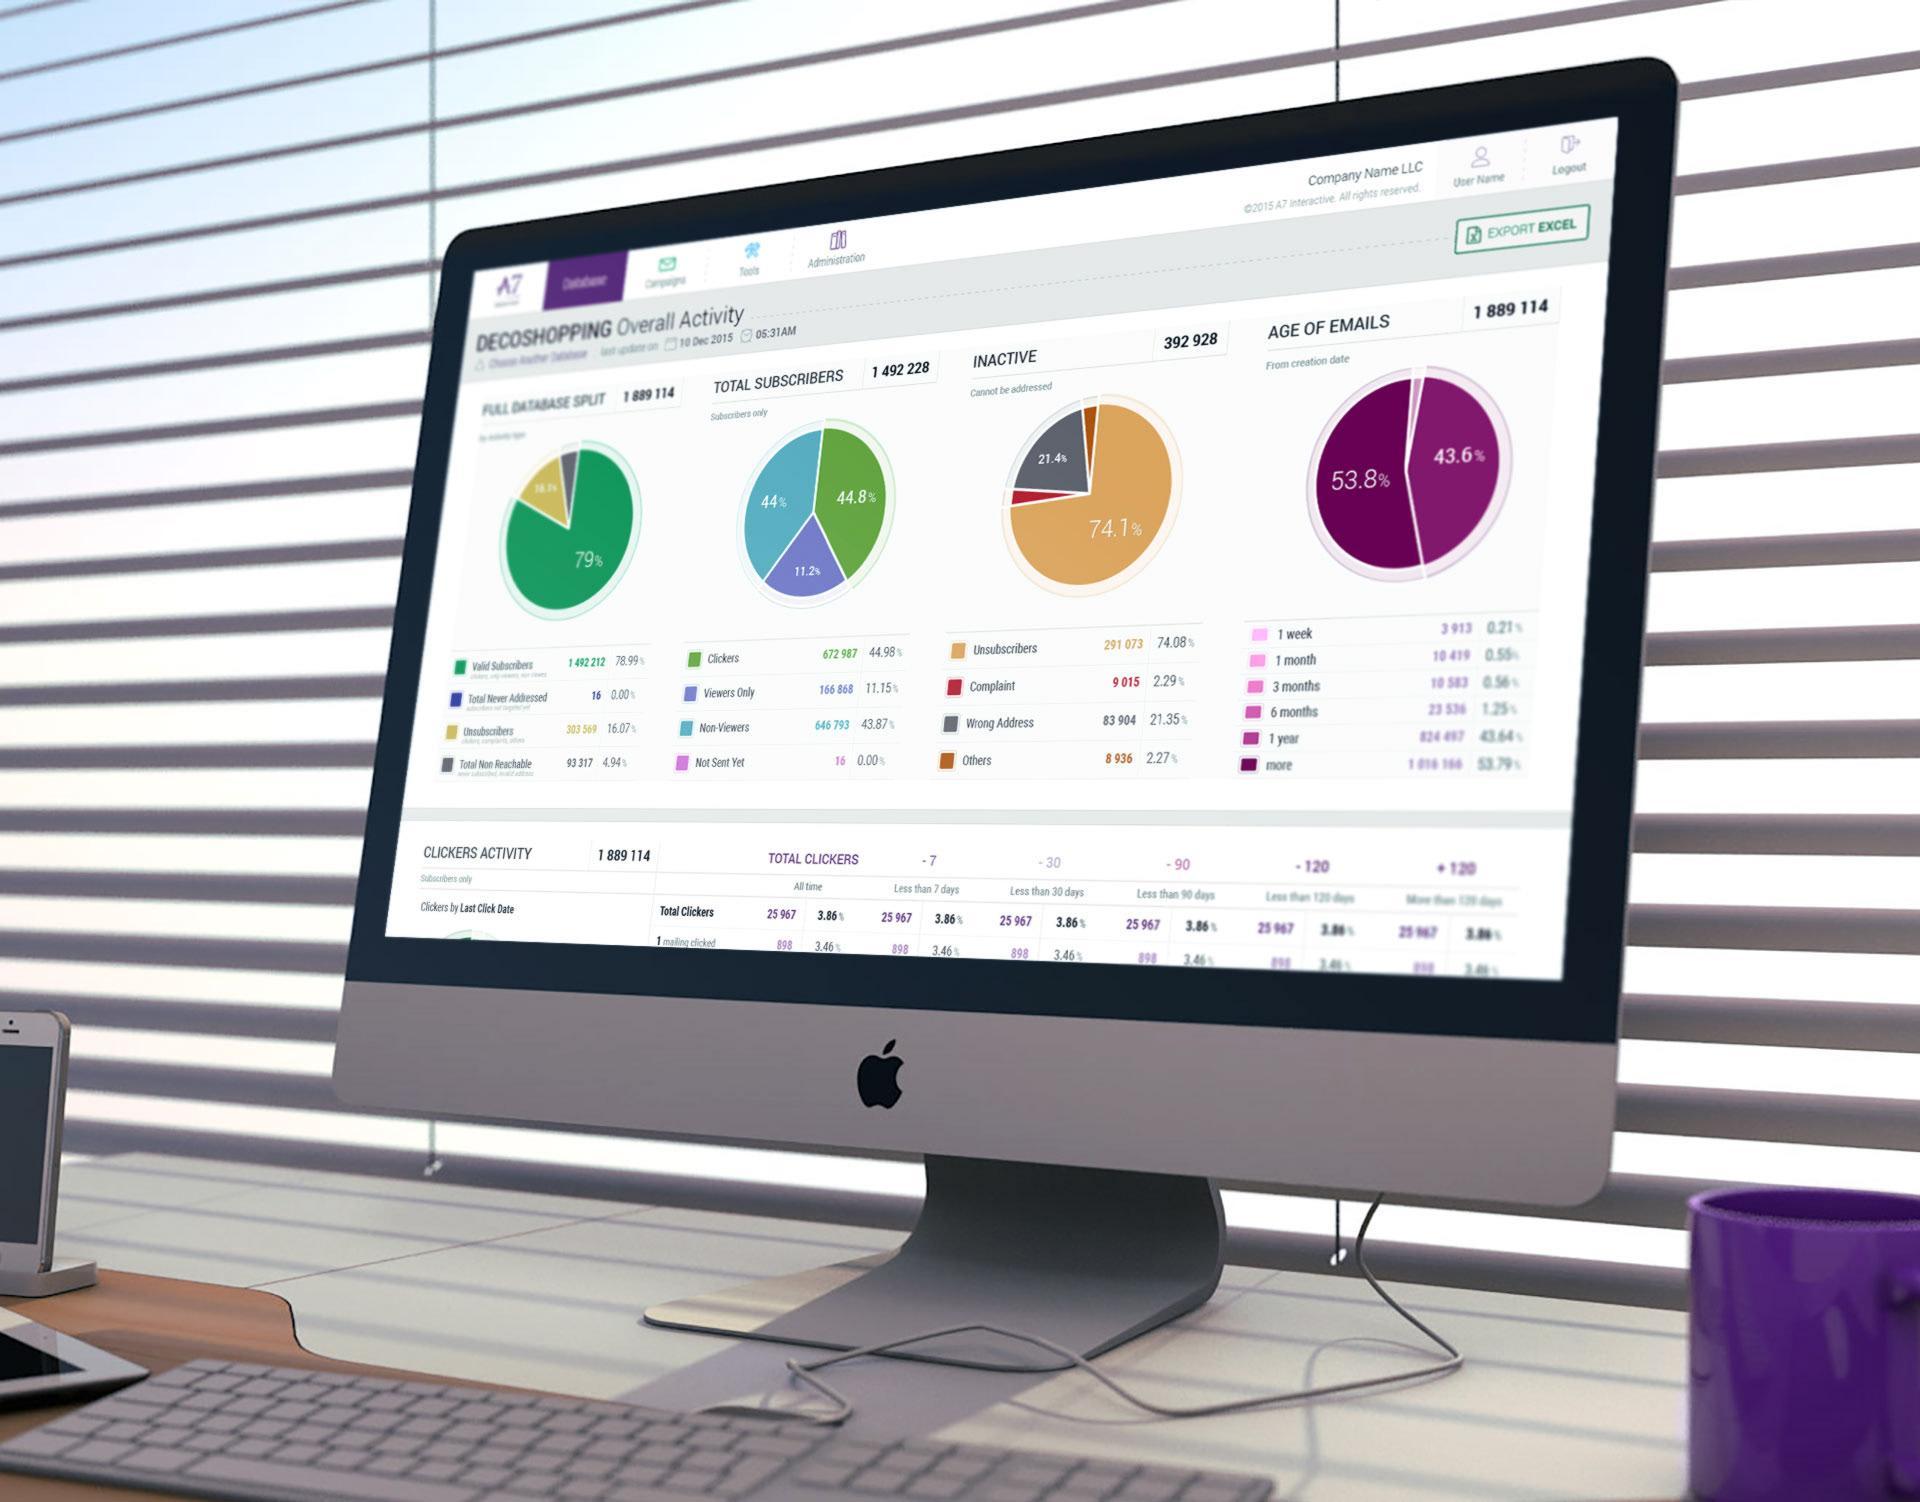 Avis A7 Emailing : Routage SaaS et Data Technologies - Appvizer